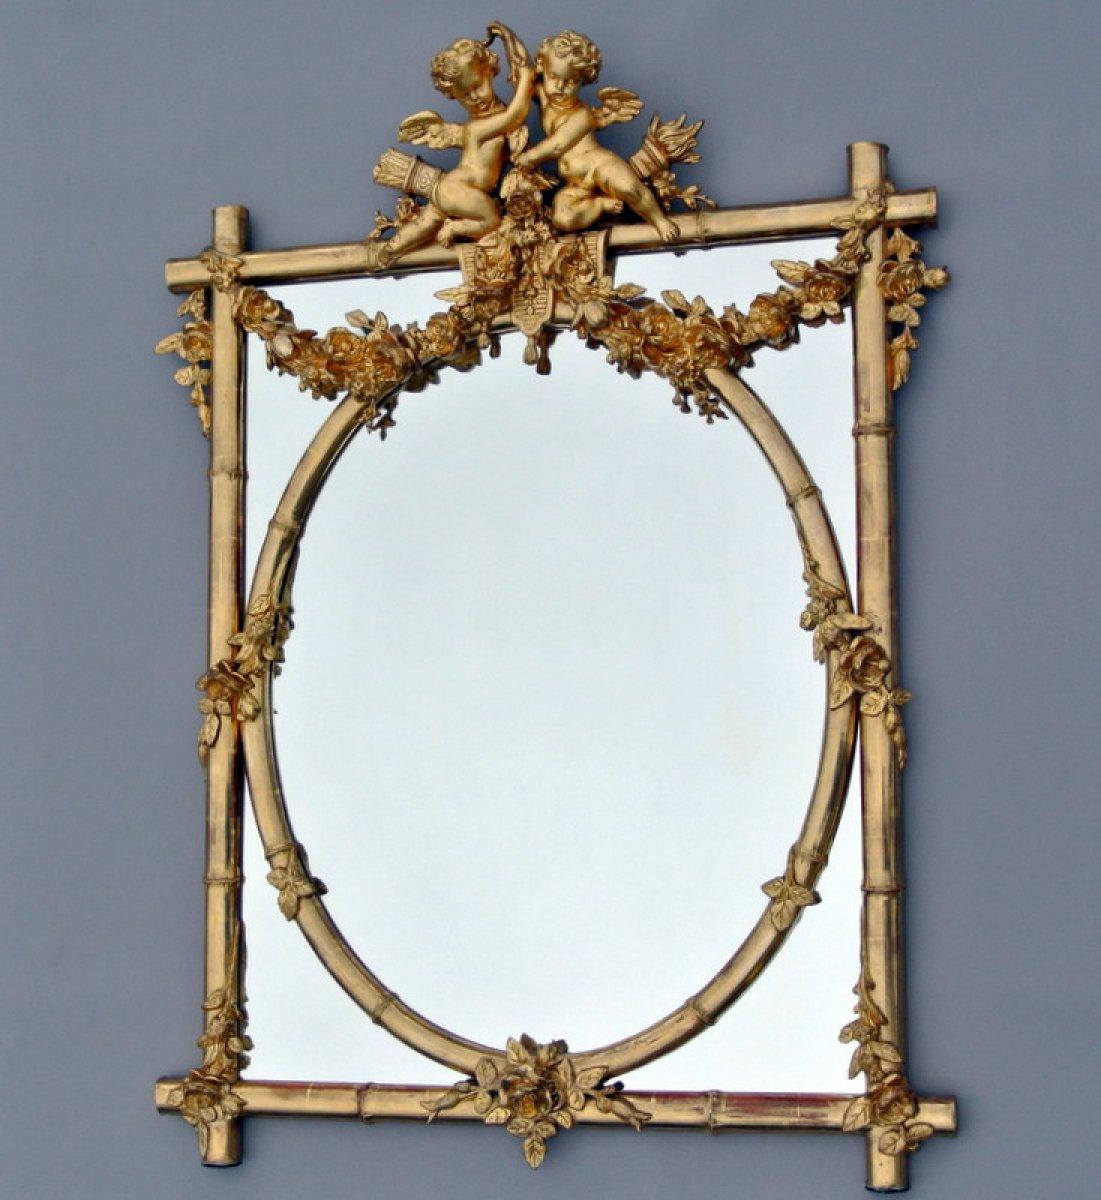 Miroir napol on iii xixe si cle for Marc miroir kraft